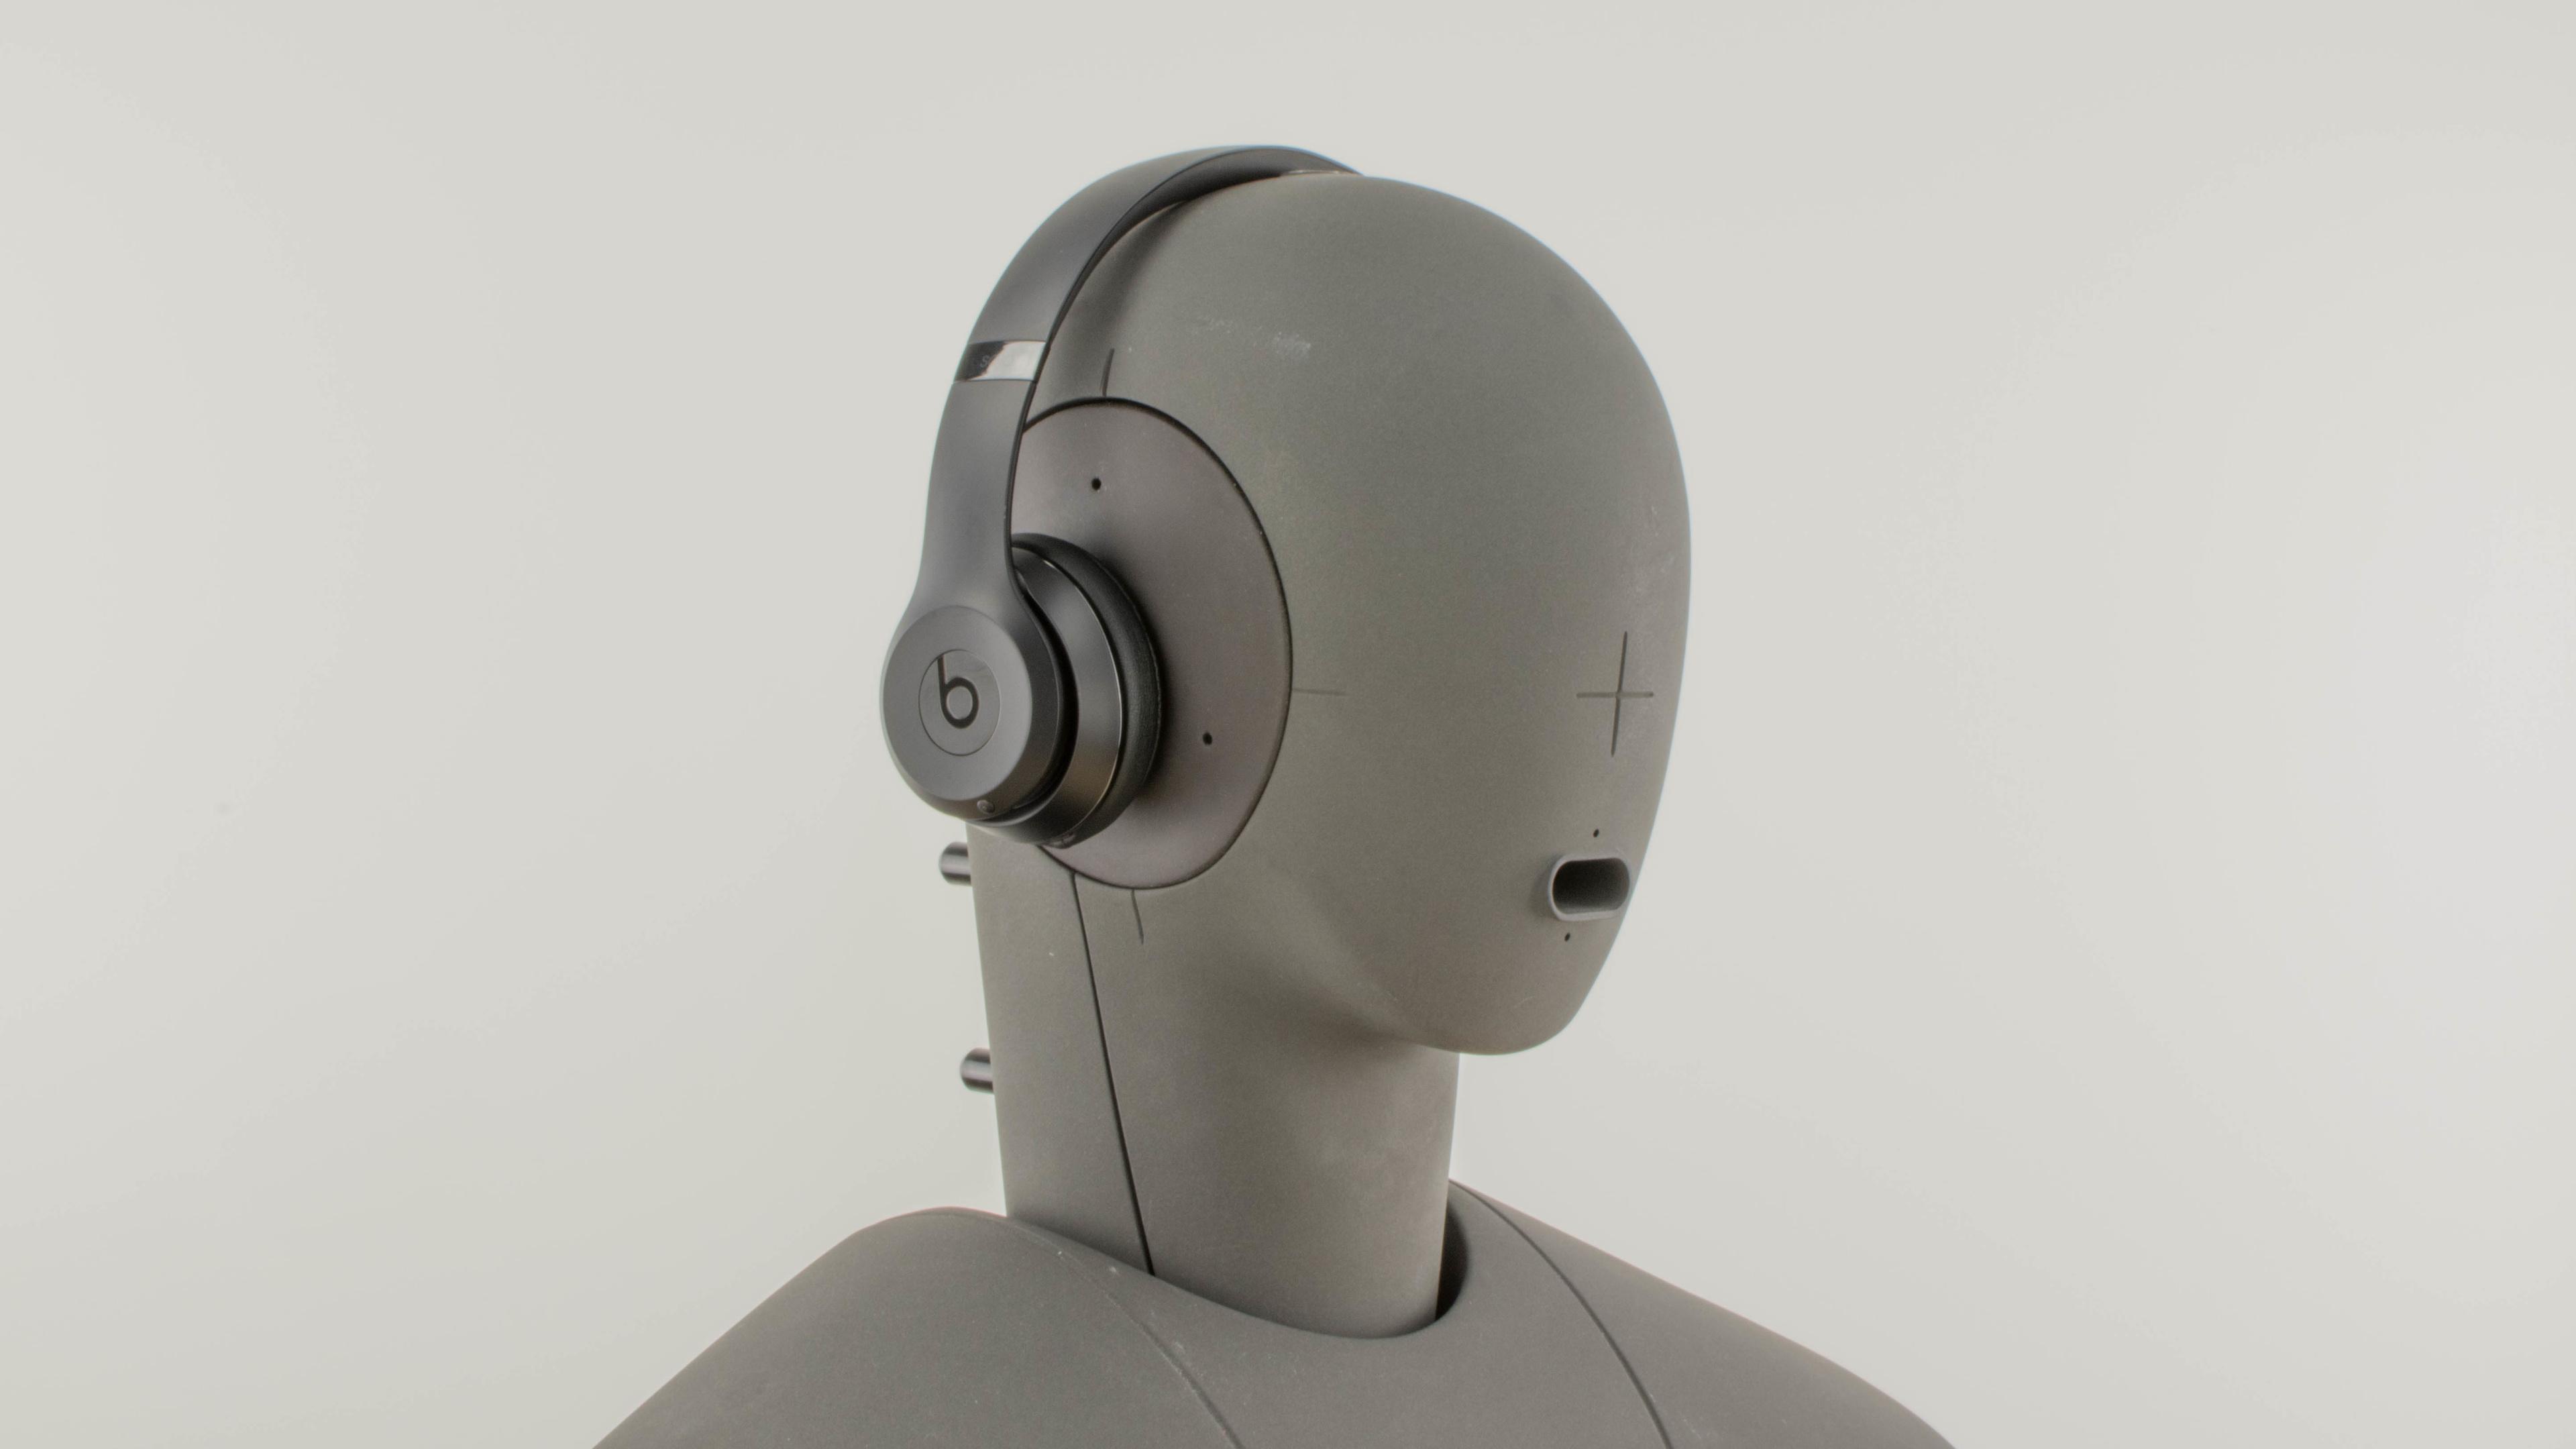 Wireless headphones bluetooth headphones - headphones bluetooth in ear wireless